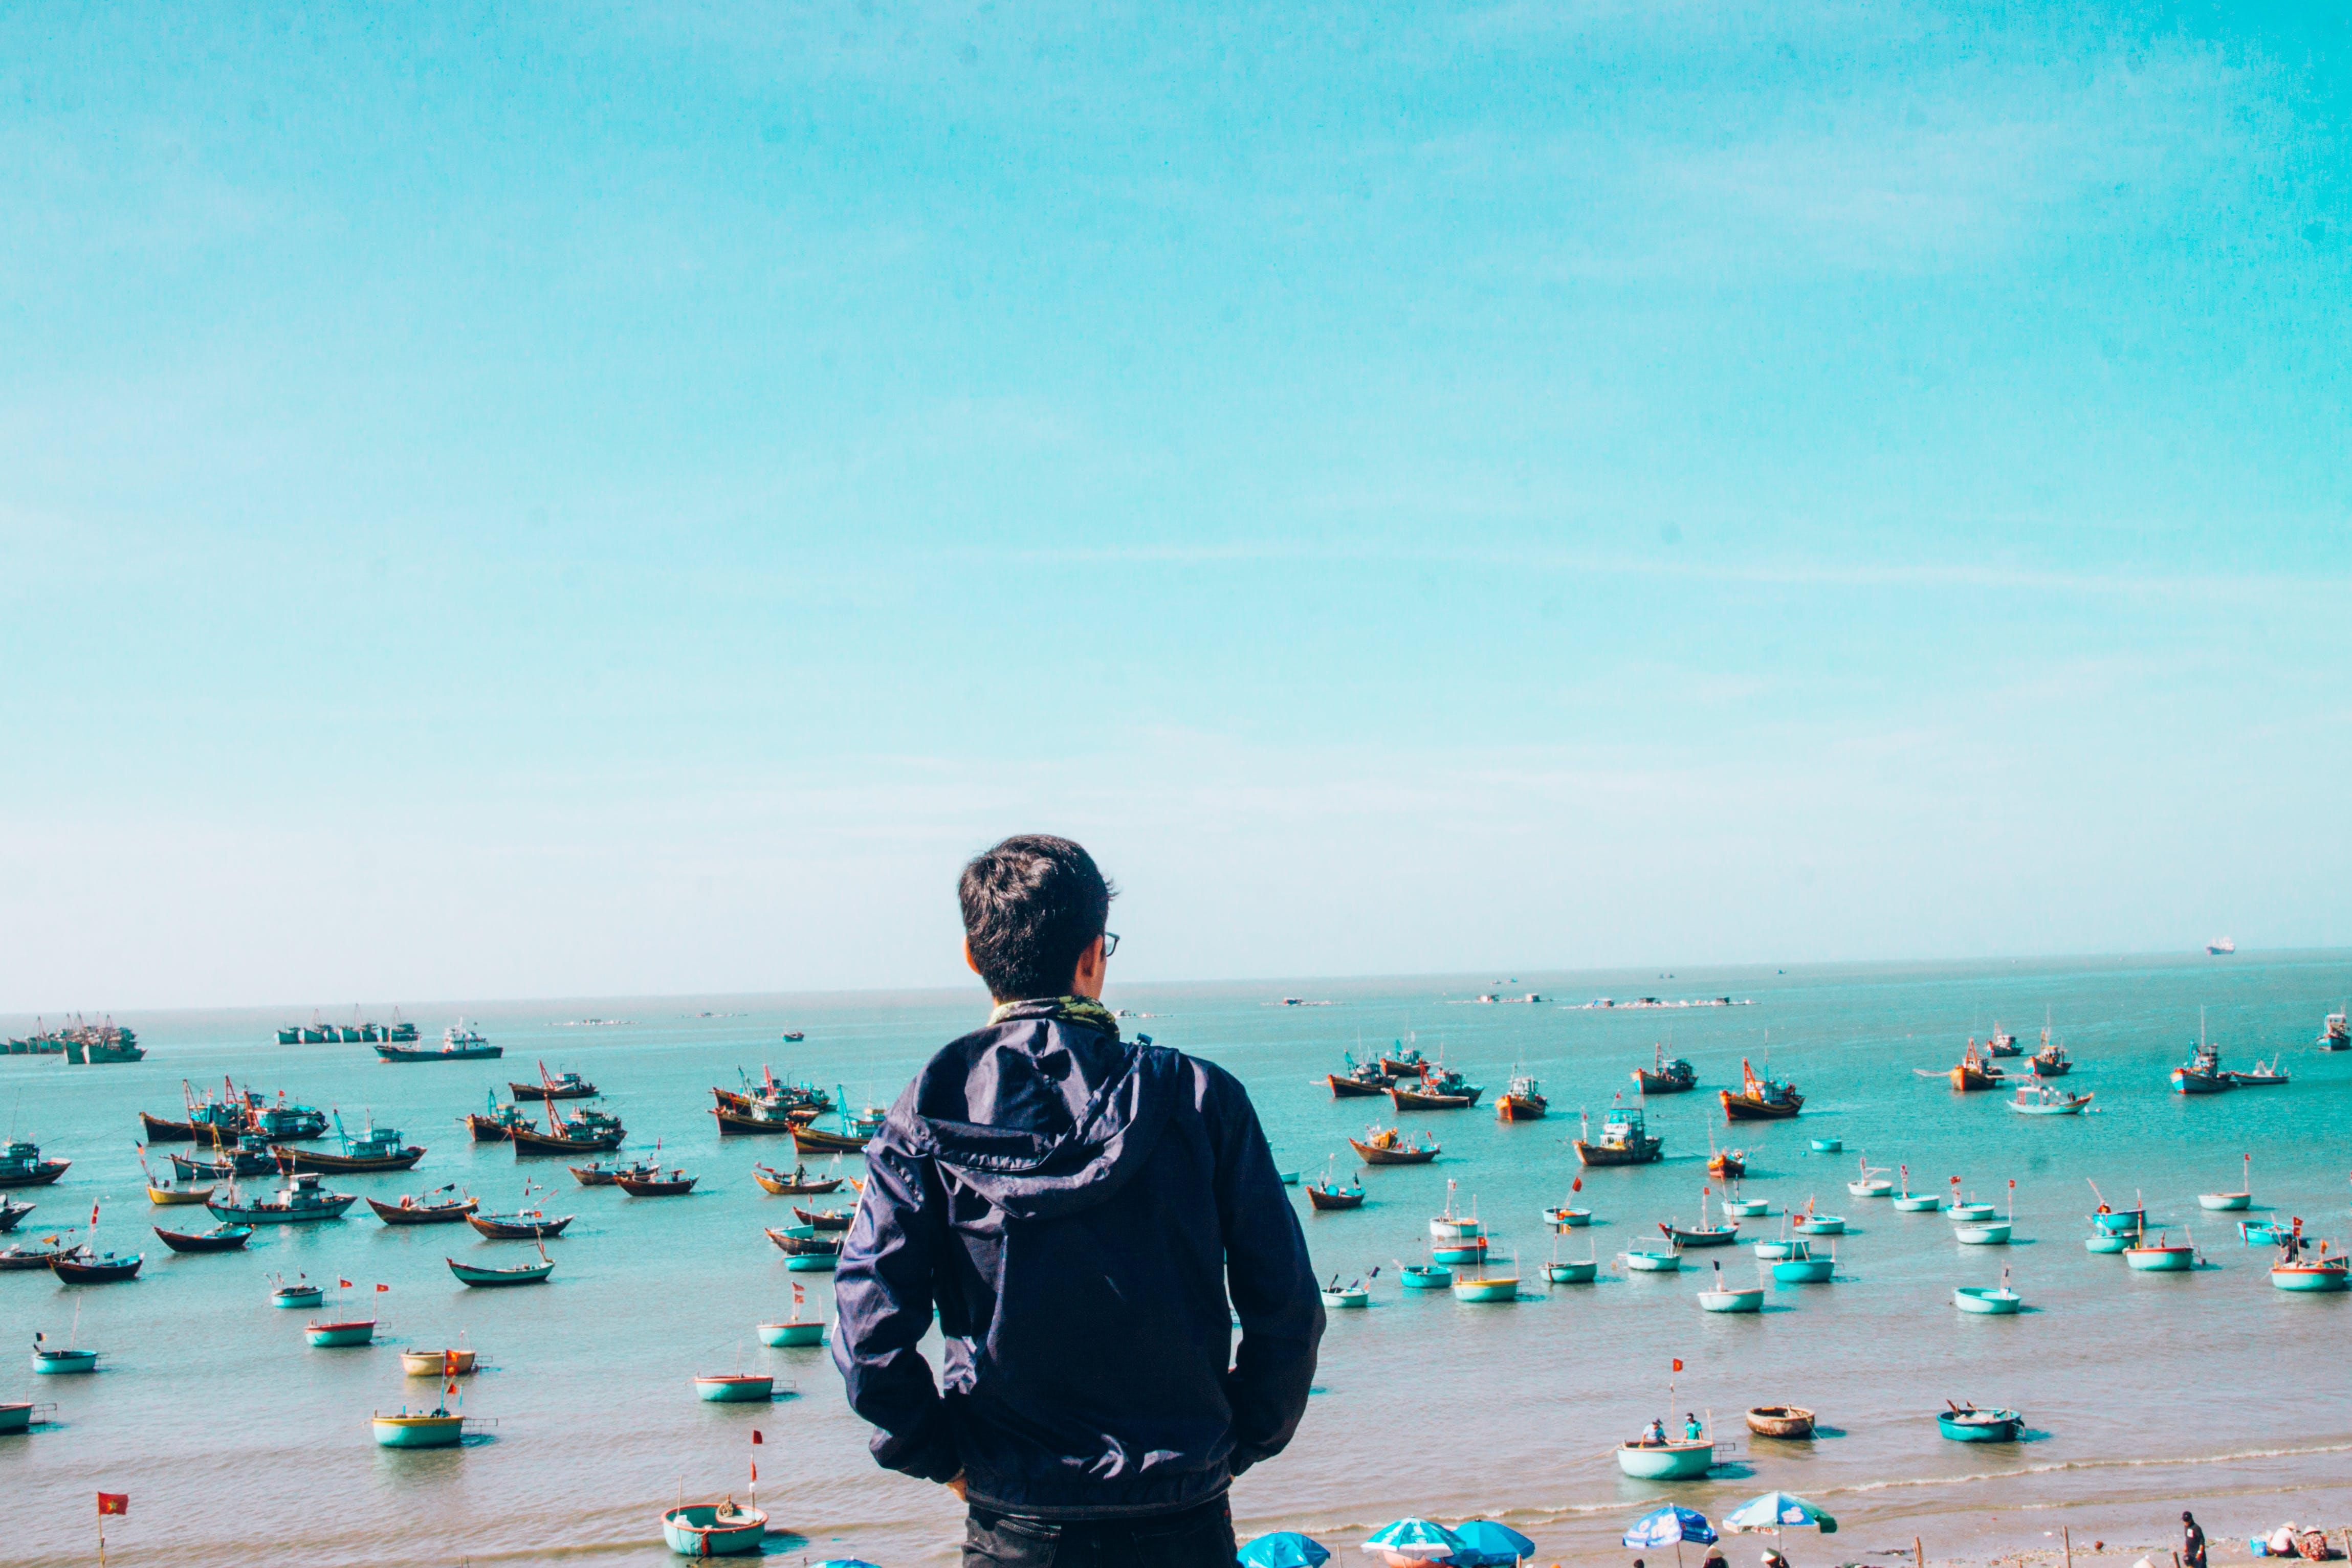 Kostenloses Stock Foto zu blauer himmel, blaues meer, boot, heißer junge